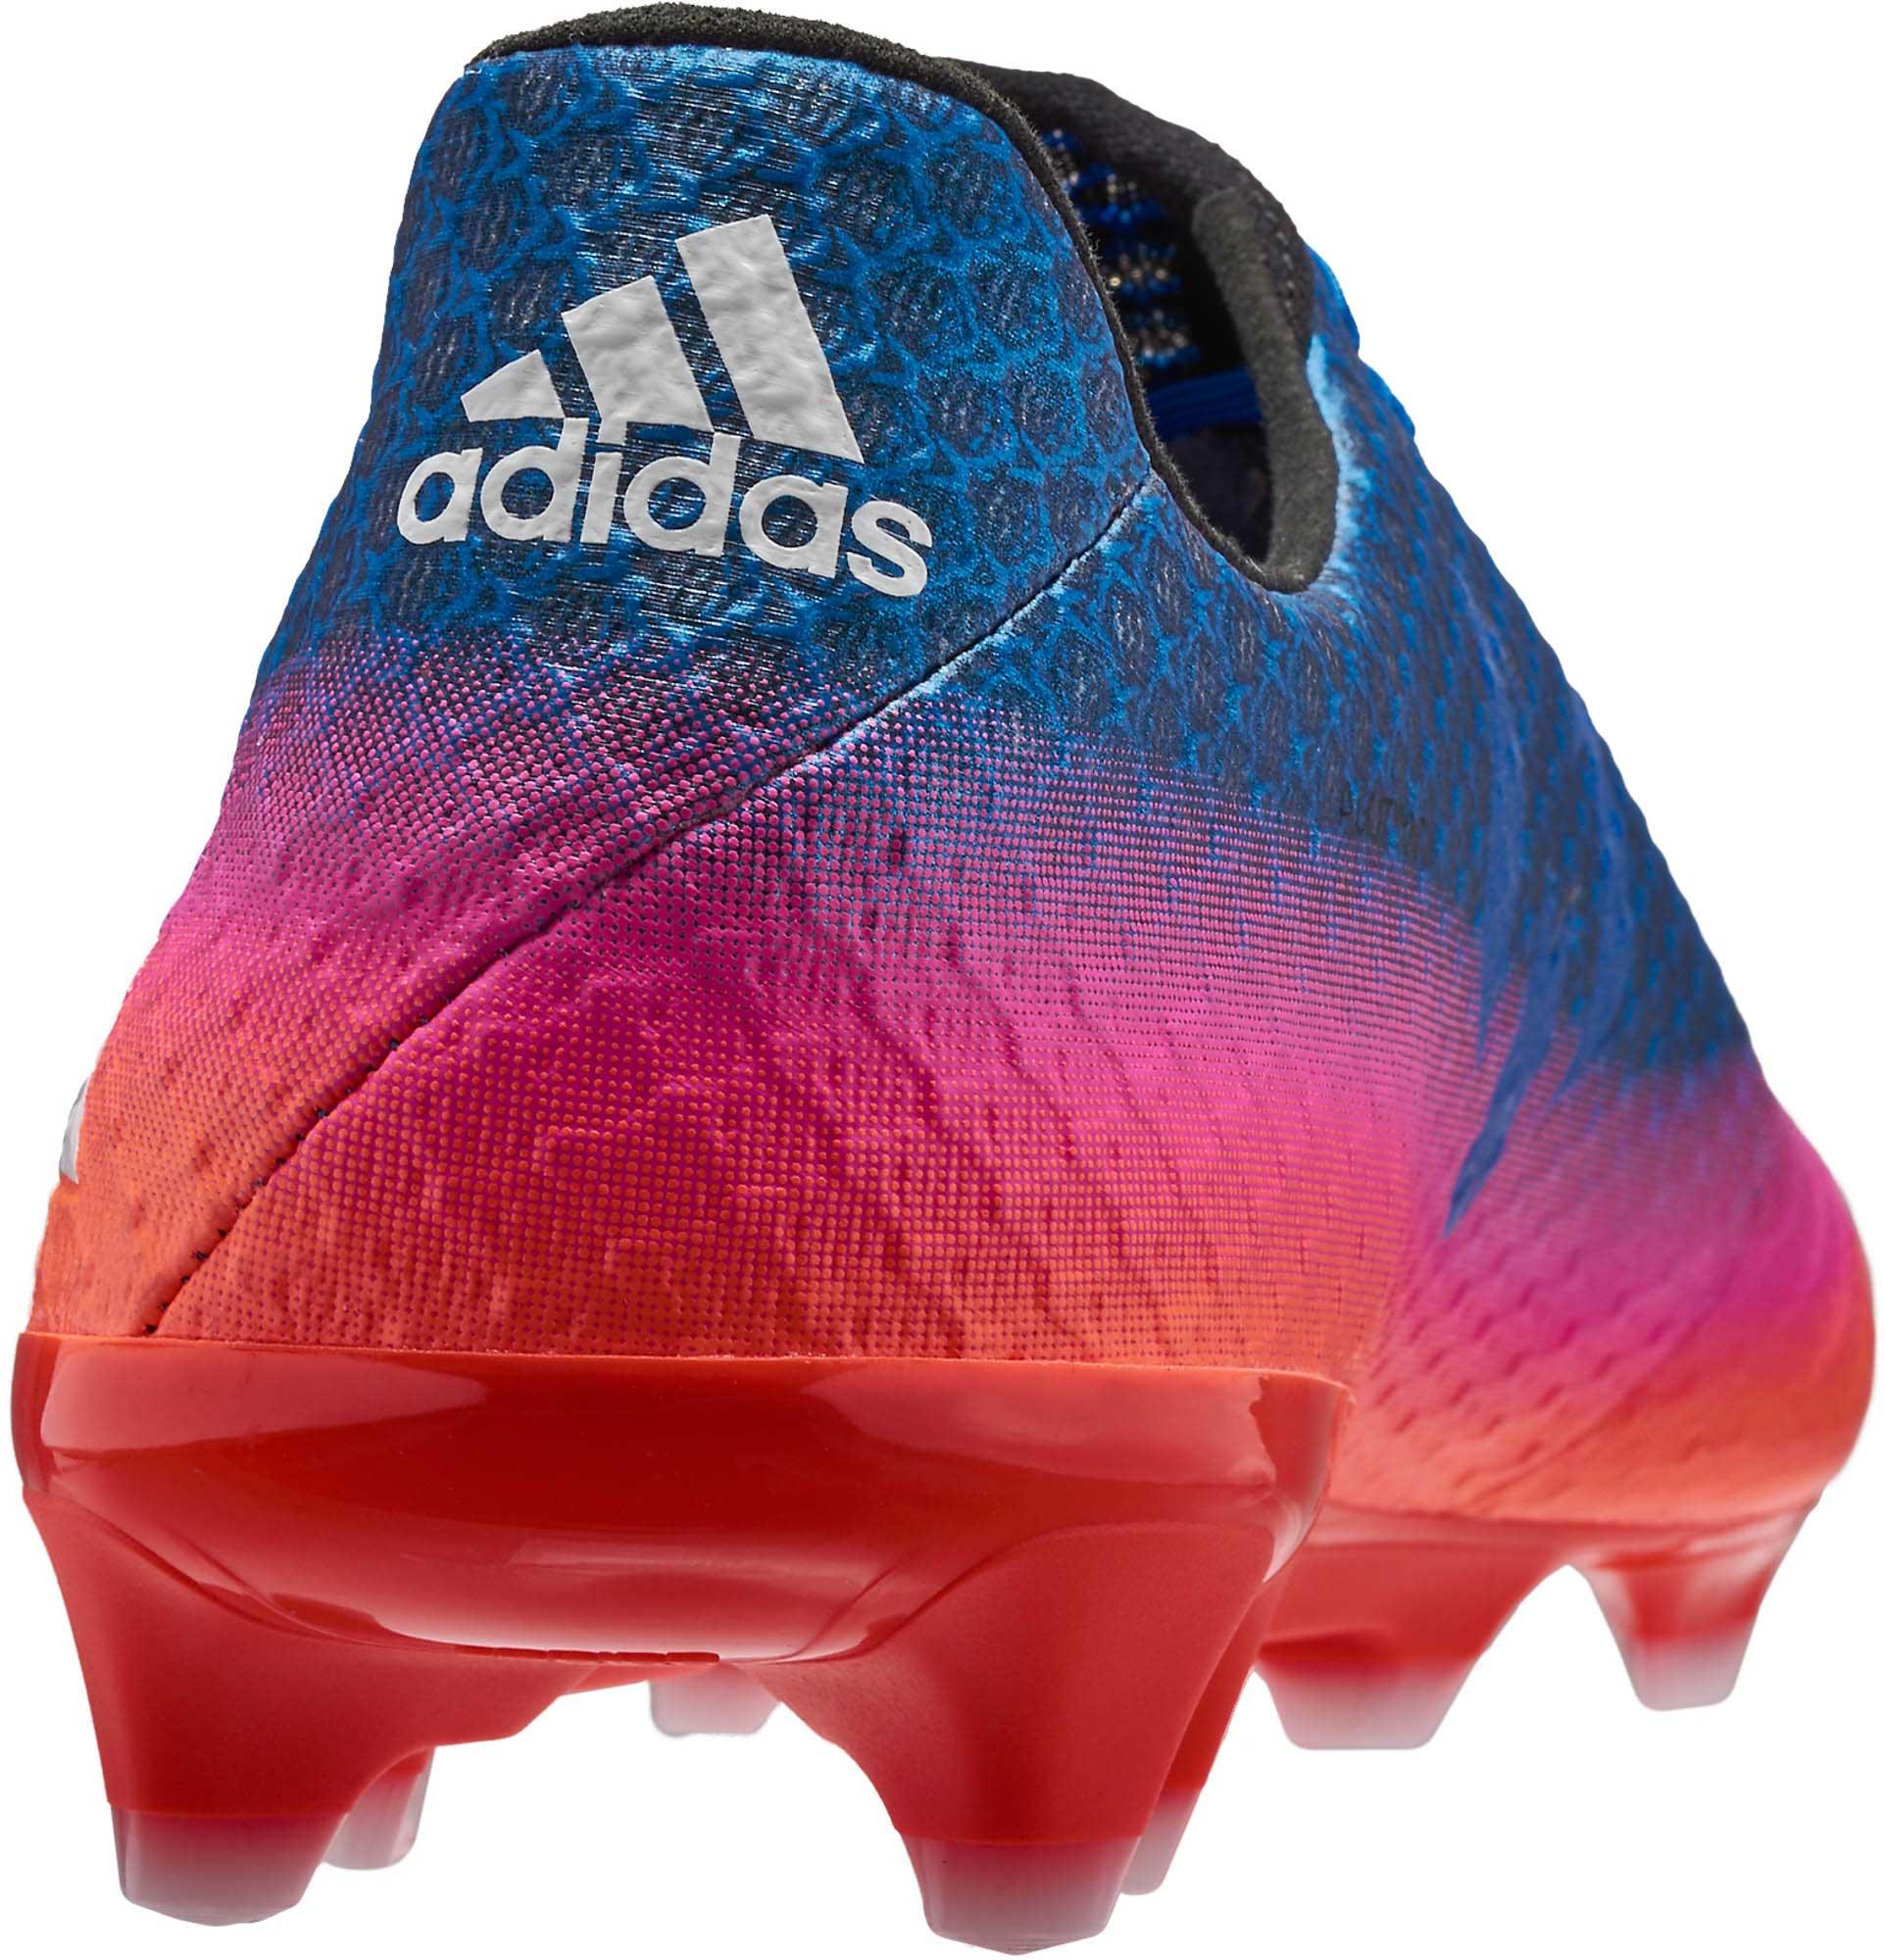 adidas Messi 16.1 FG Cleats- adidas